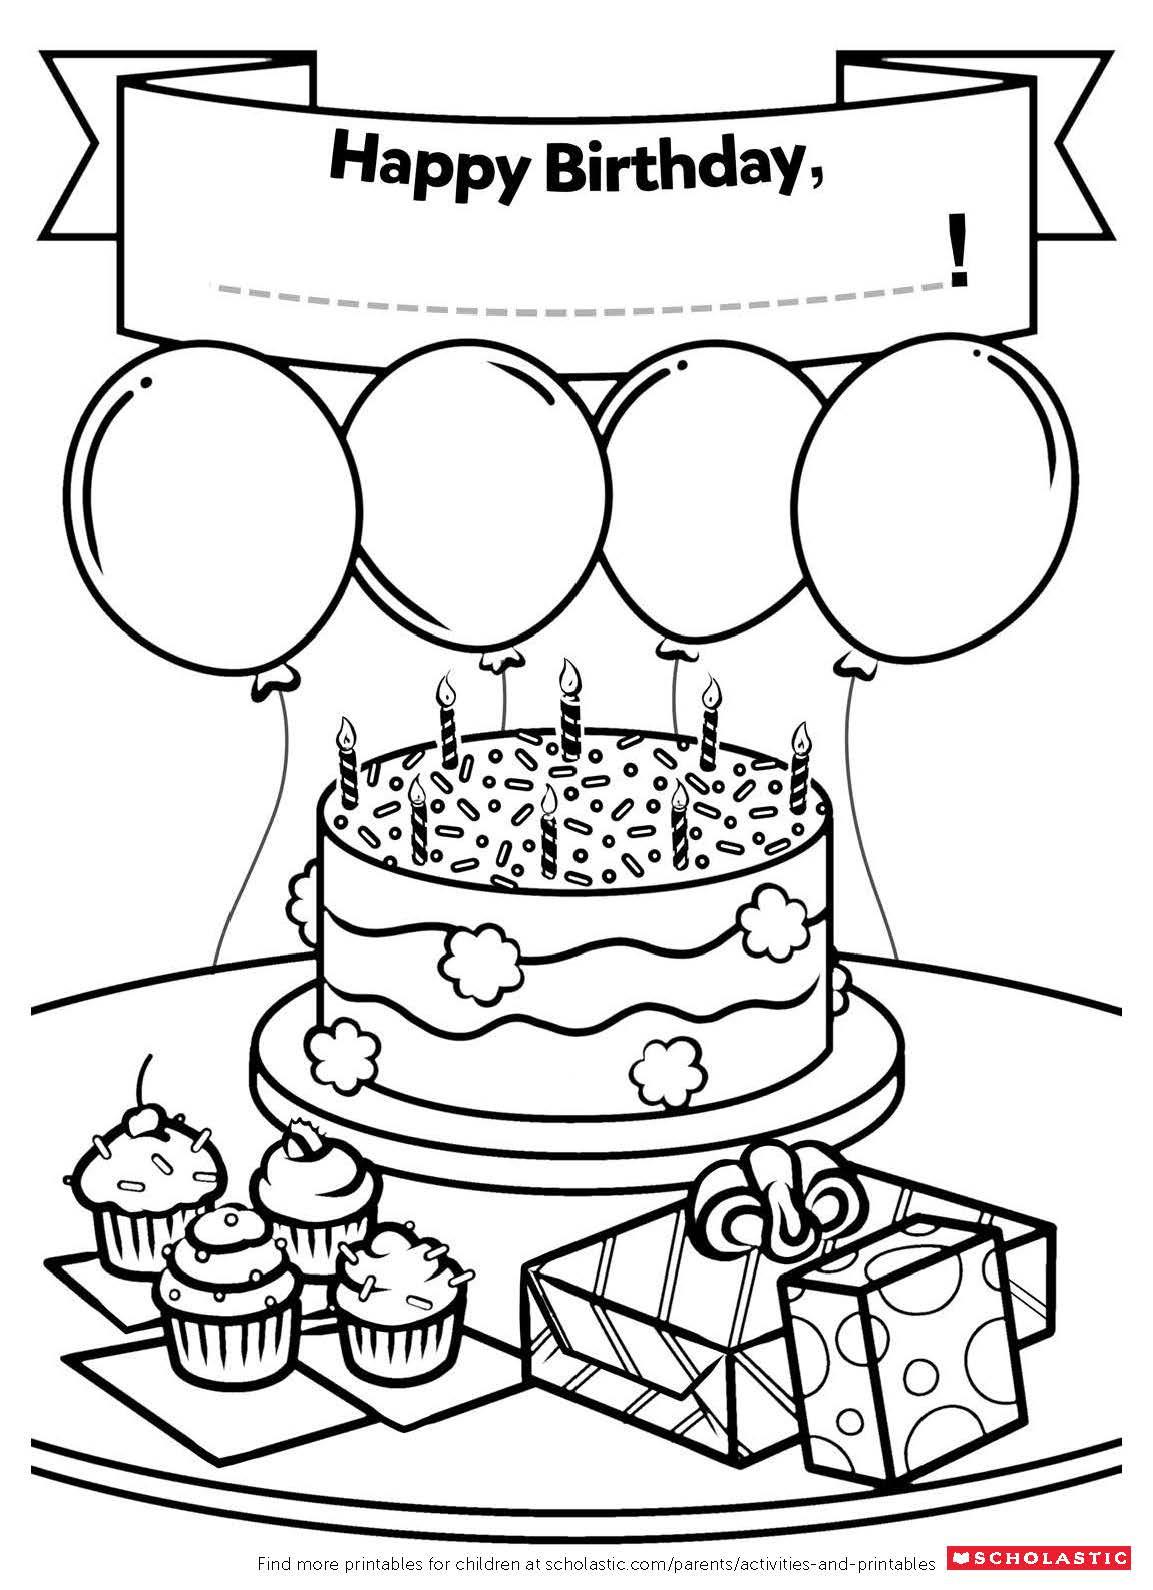 Free Printable Kids Birthday Cards  A Homemade Birthday Card